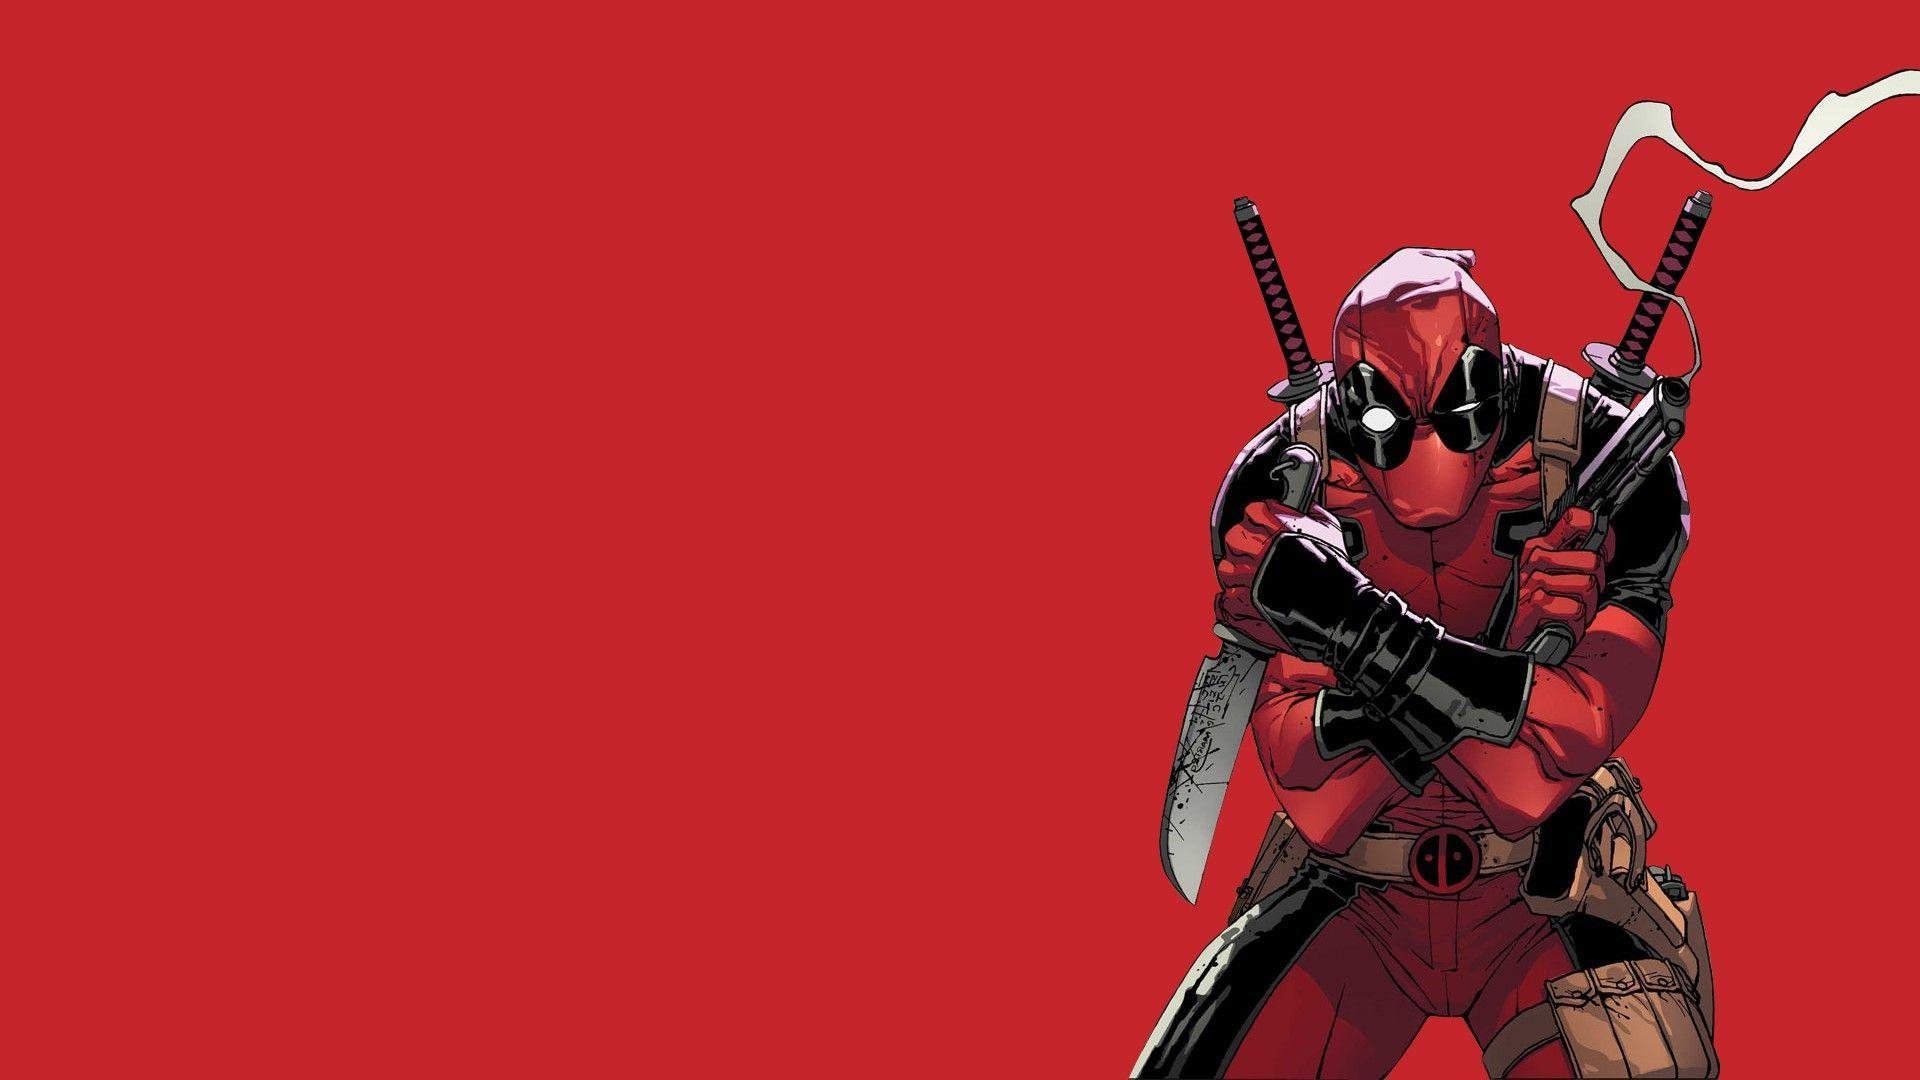 Spider Man Deadpool Wallpapers HD Desktop And Mobile Backgrounds